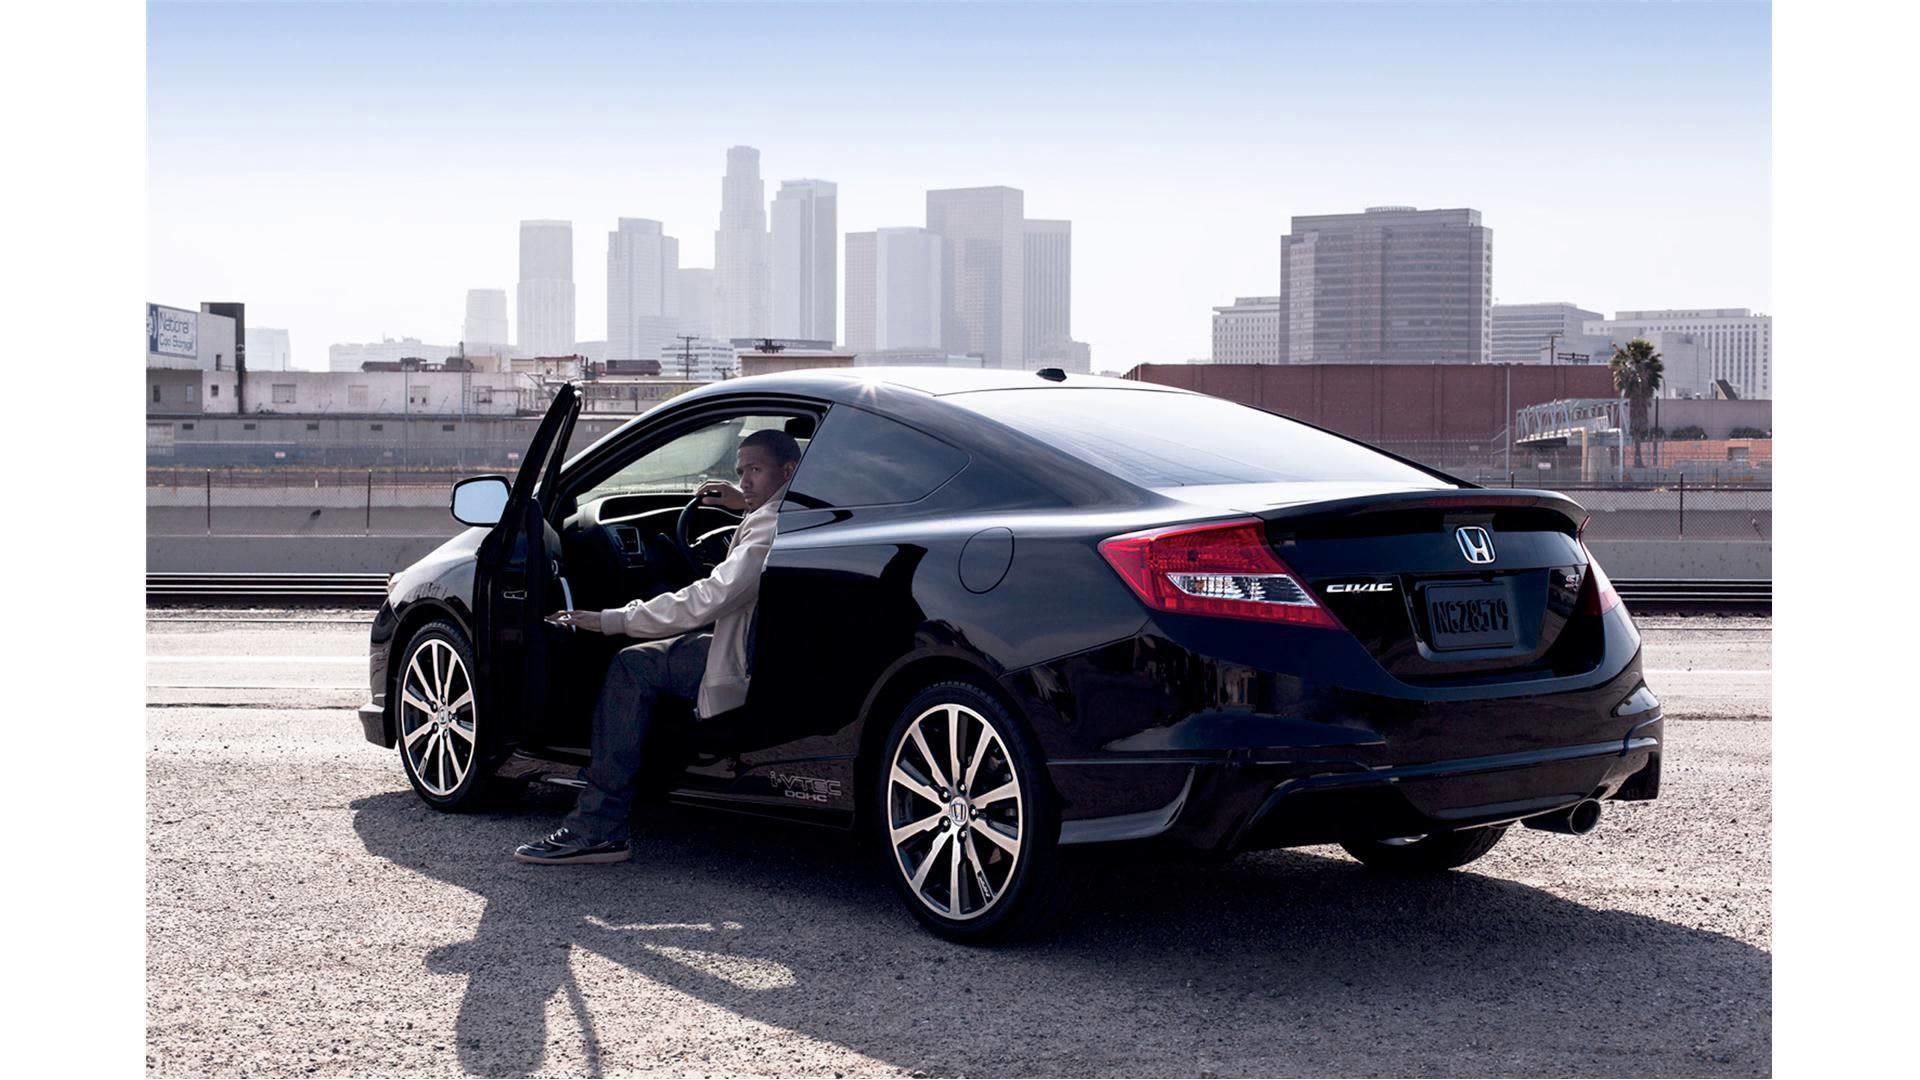 Honda Civic Si Wallpaper (52+ Images